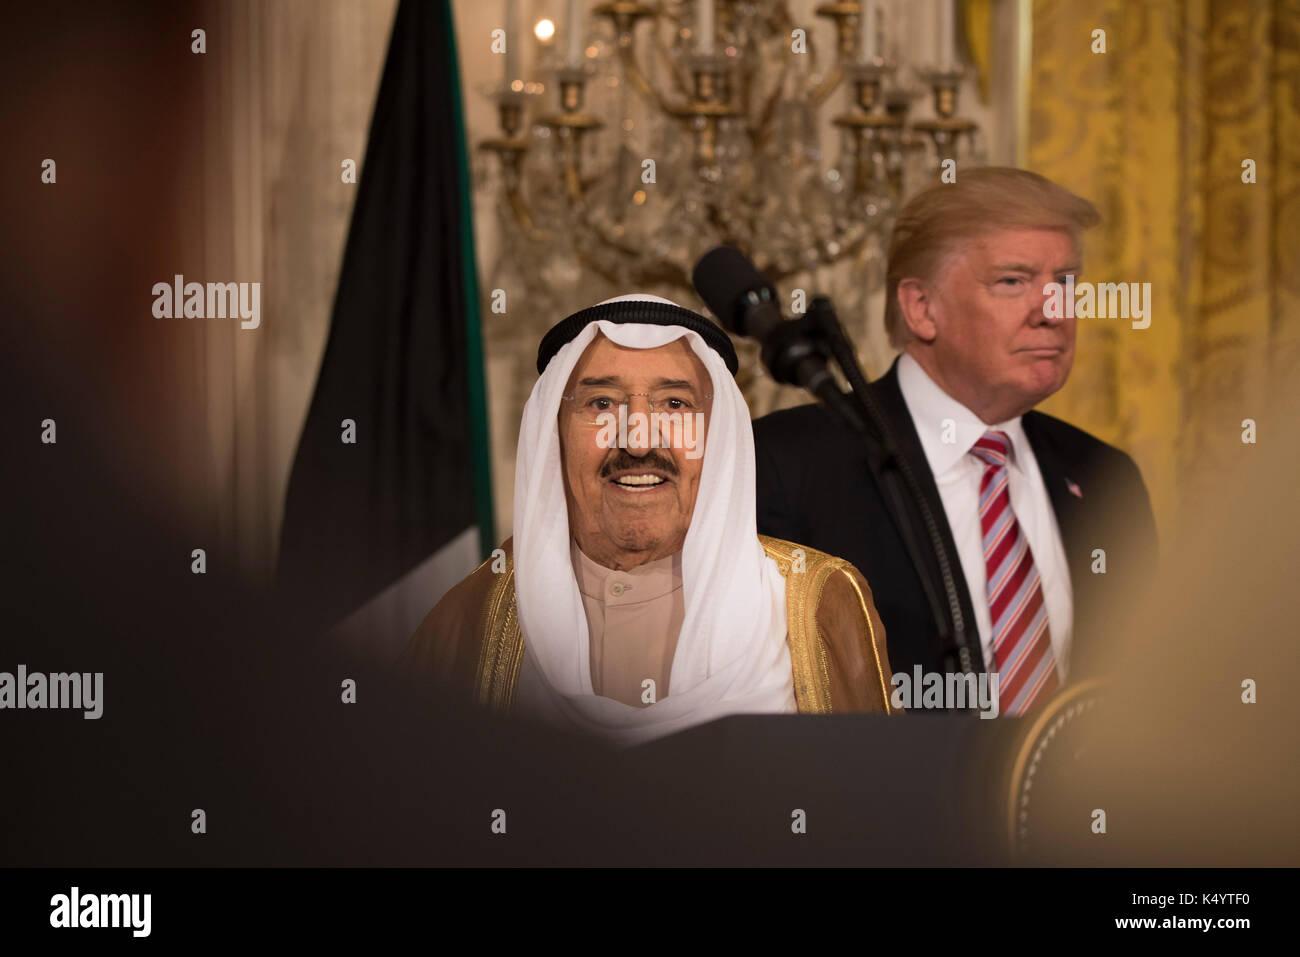 Washington DC, USA. 07 Sep, 2017. Washington DC, 7. September 2017, USA: Präsident Donald J Trumpf hält eine gemeinsame Stockfoto